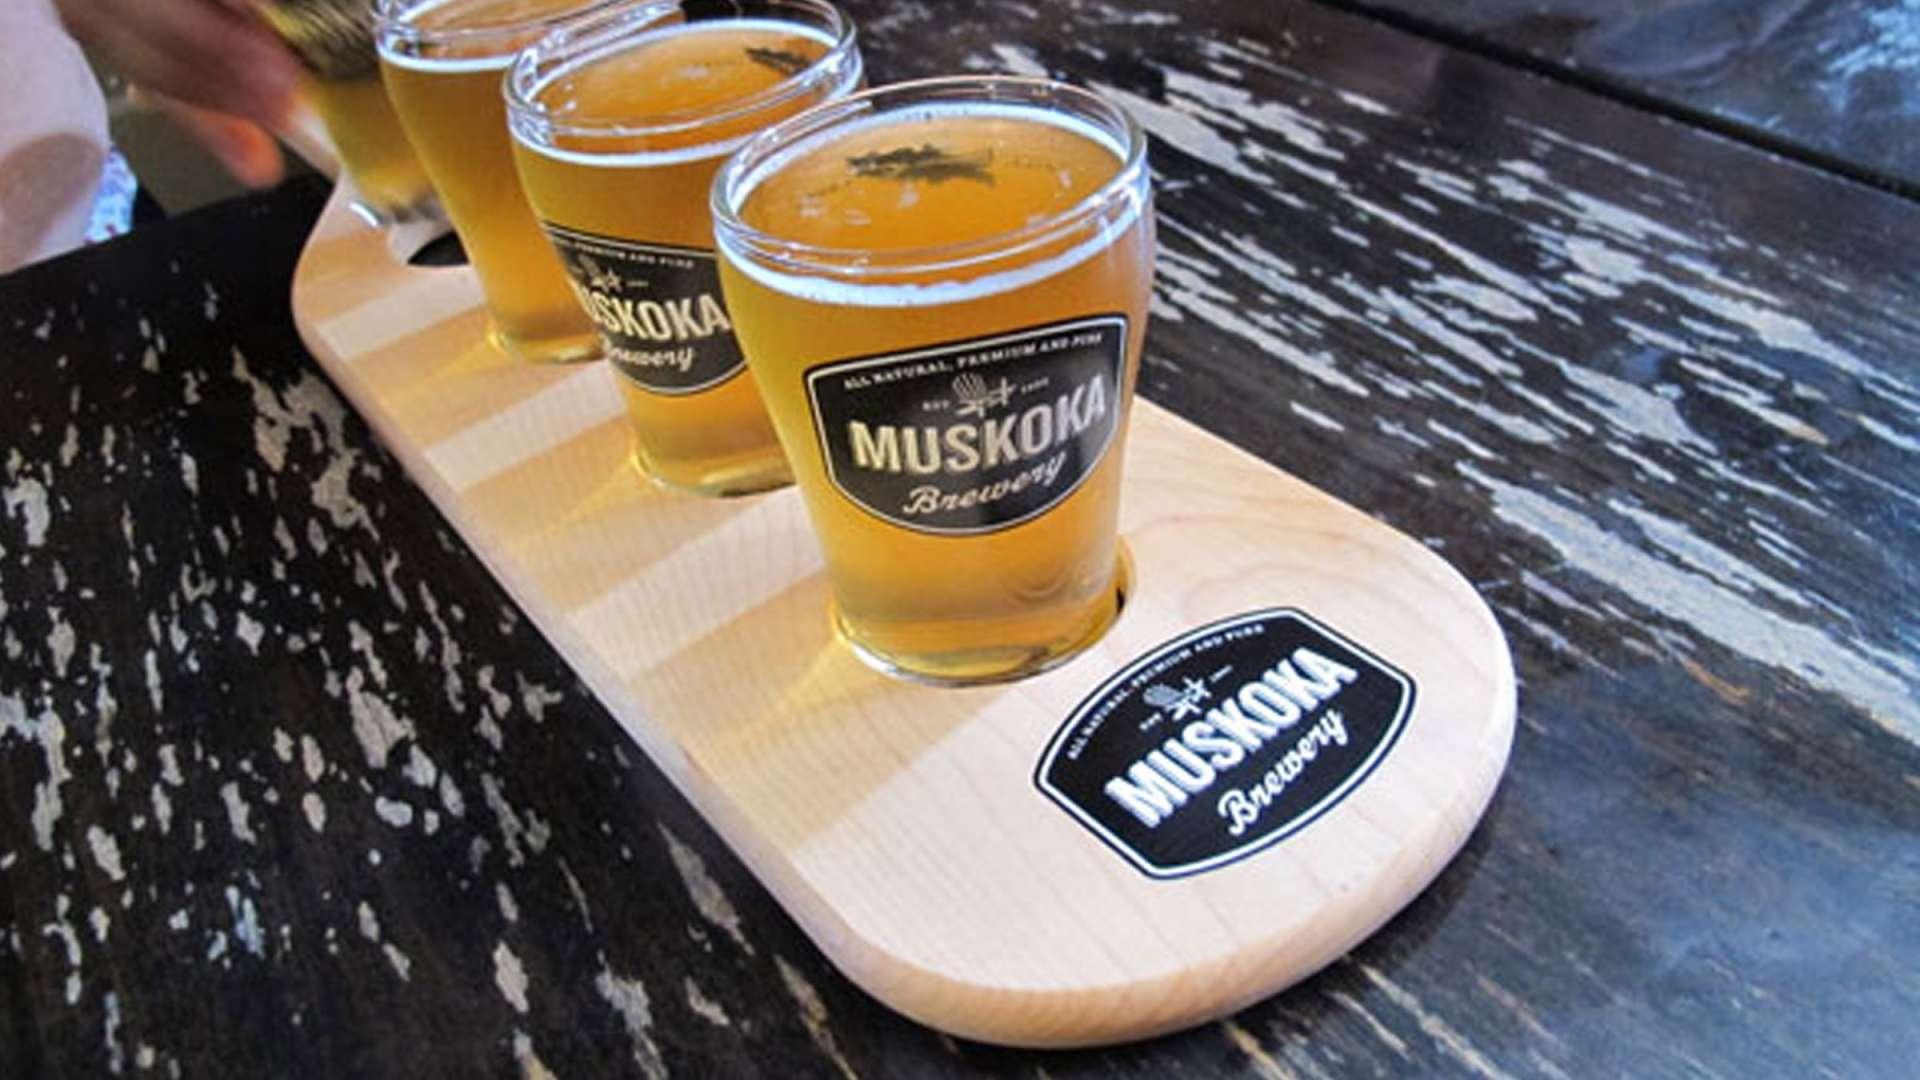 Muskoka Brewery Tours & Tap Room